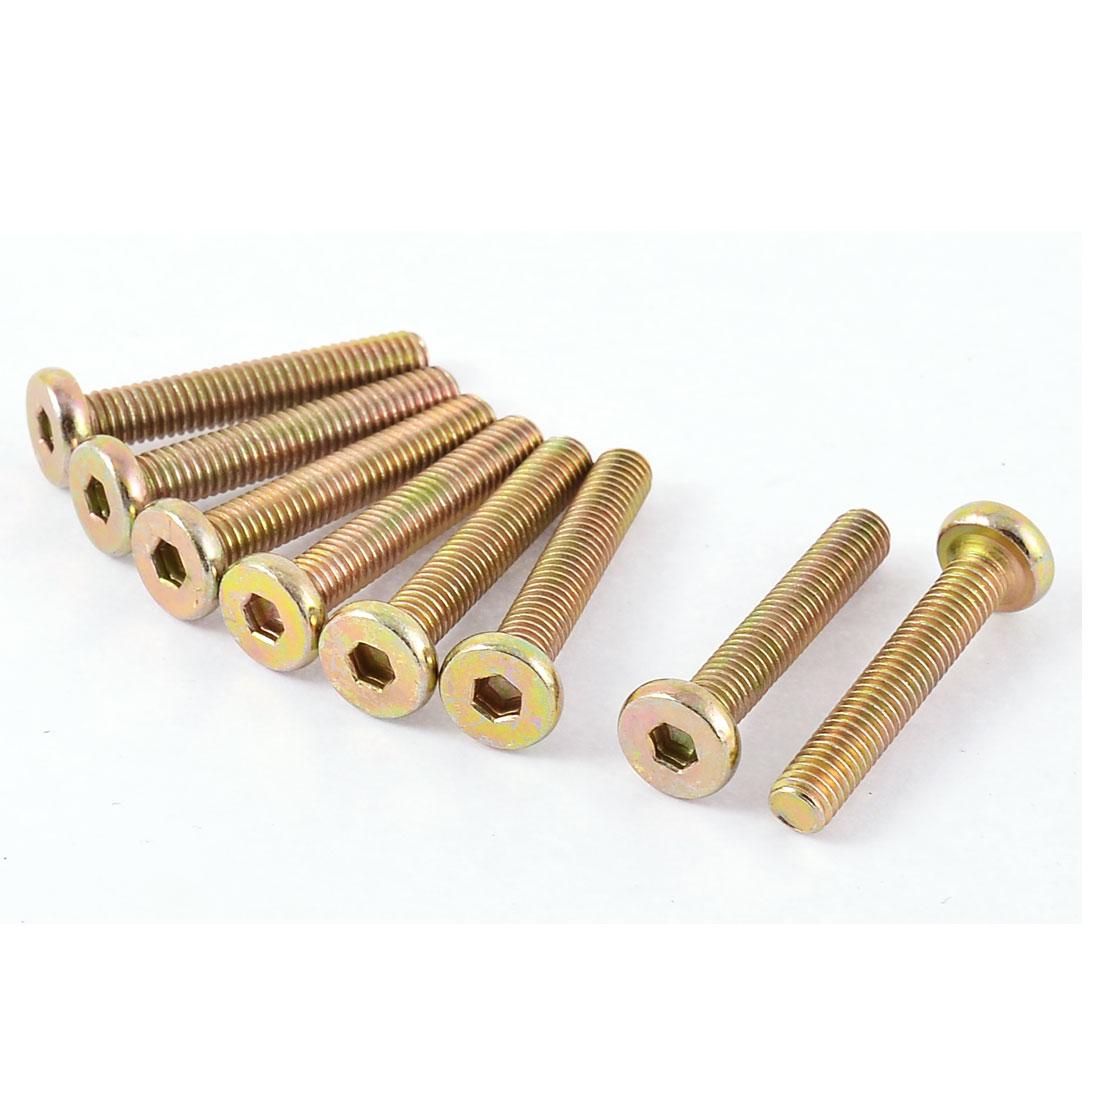 M6x35mm Metric Thread Hex Socket Head Cap Screws Bolts 4 Pcs